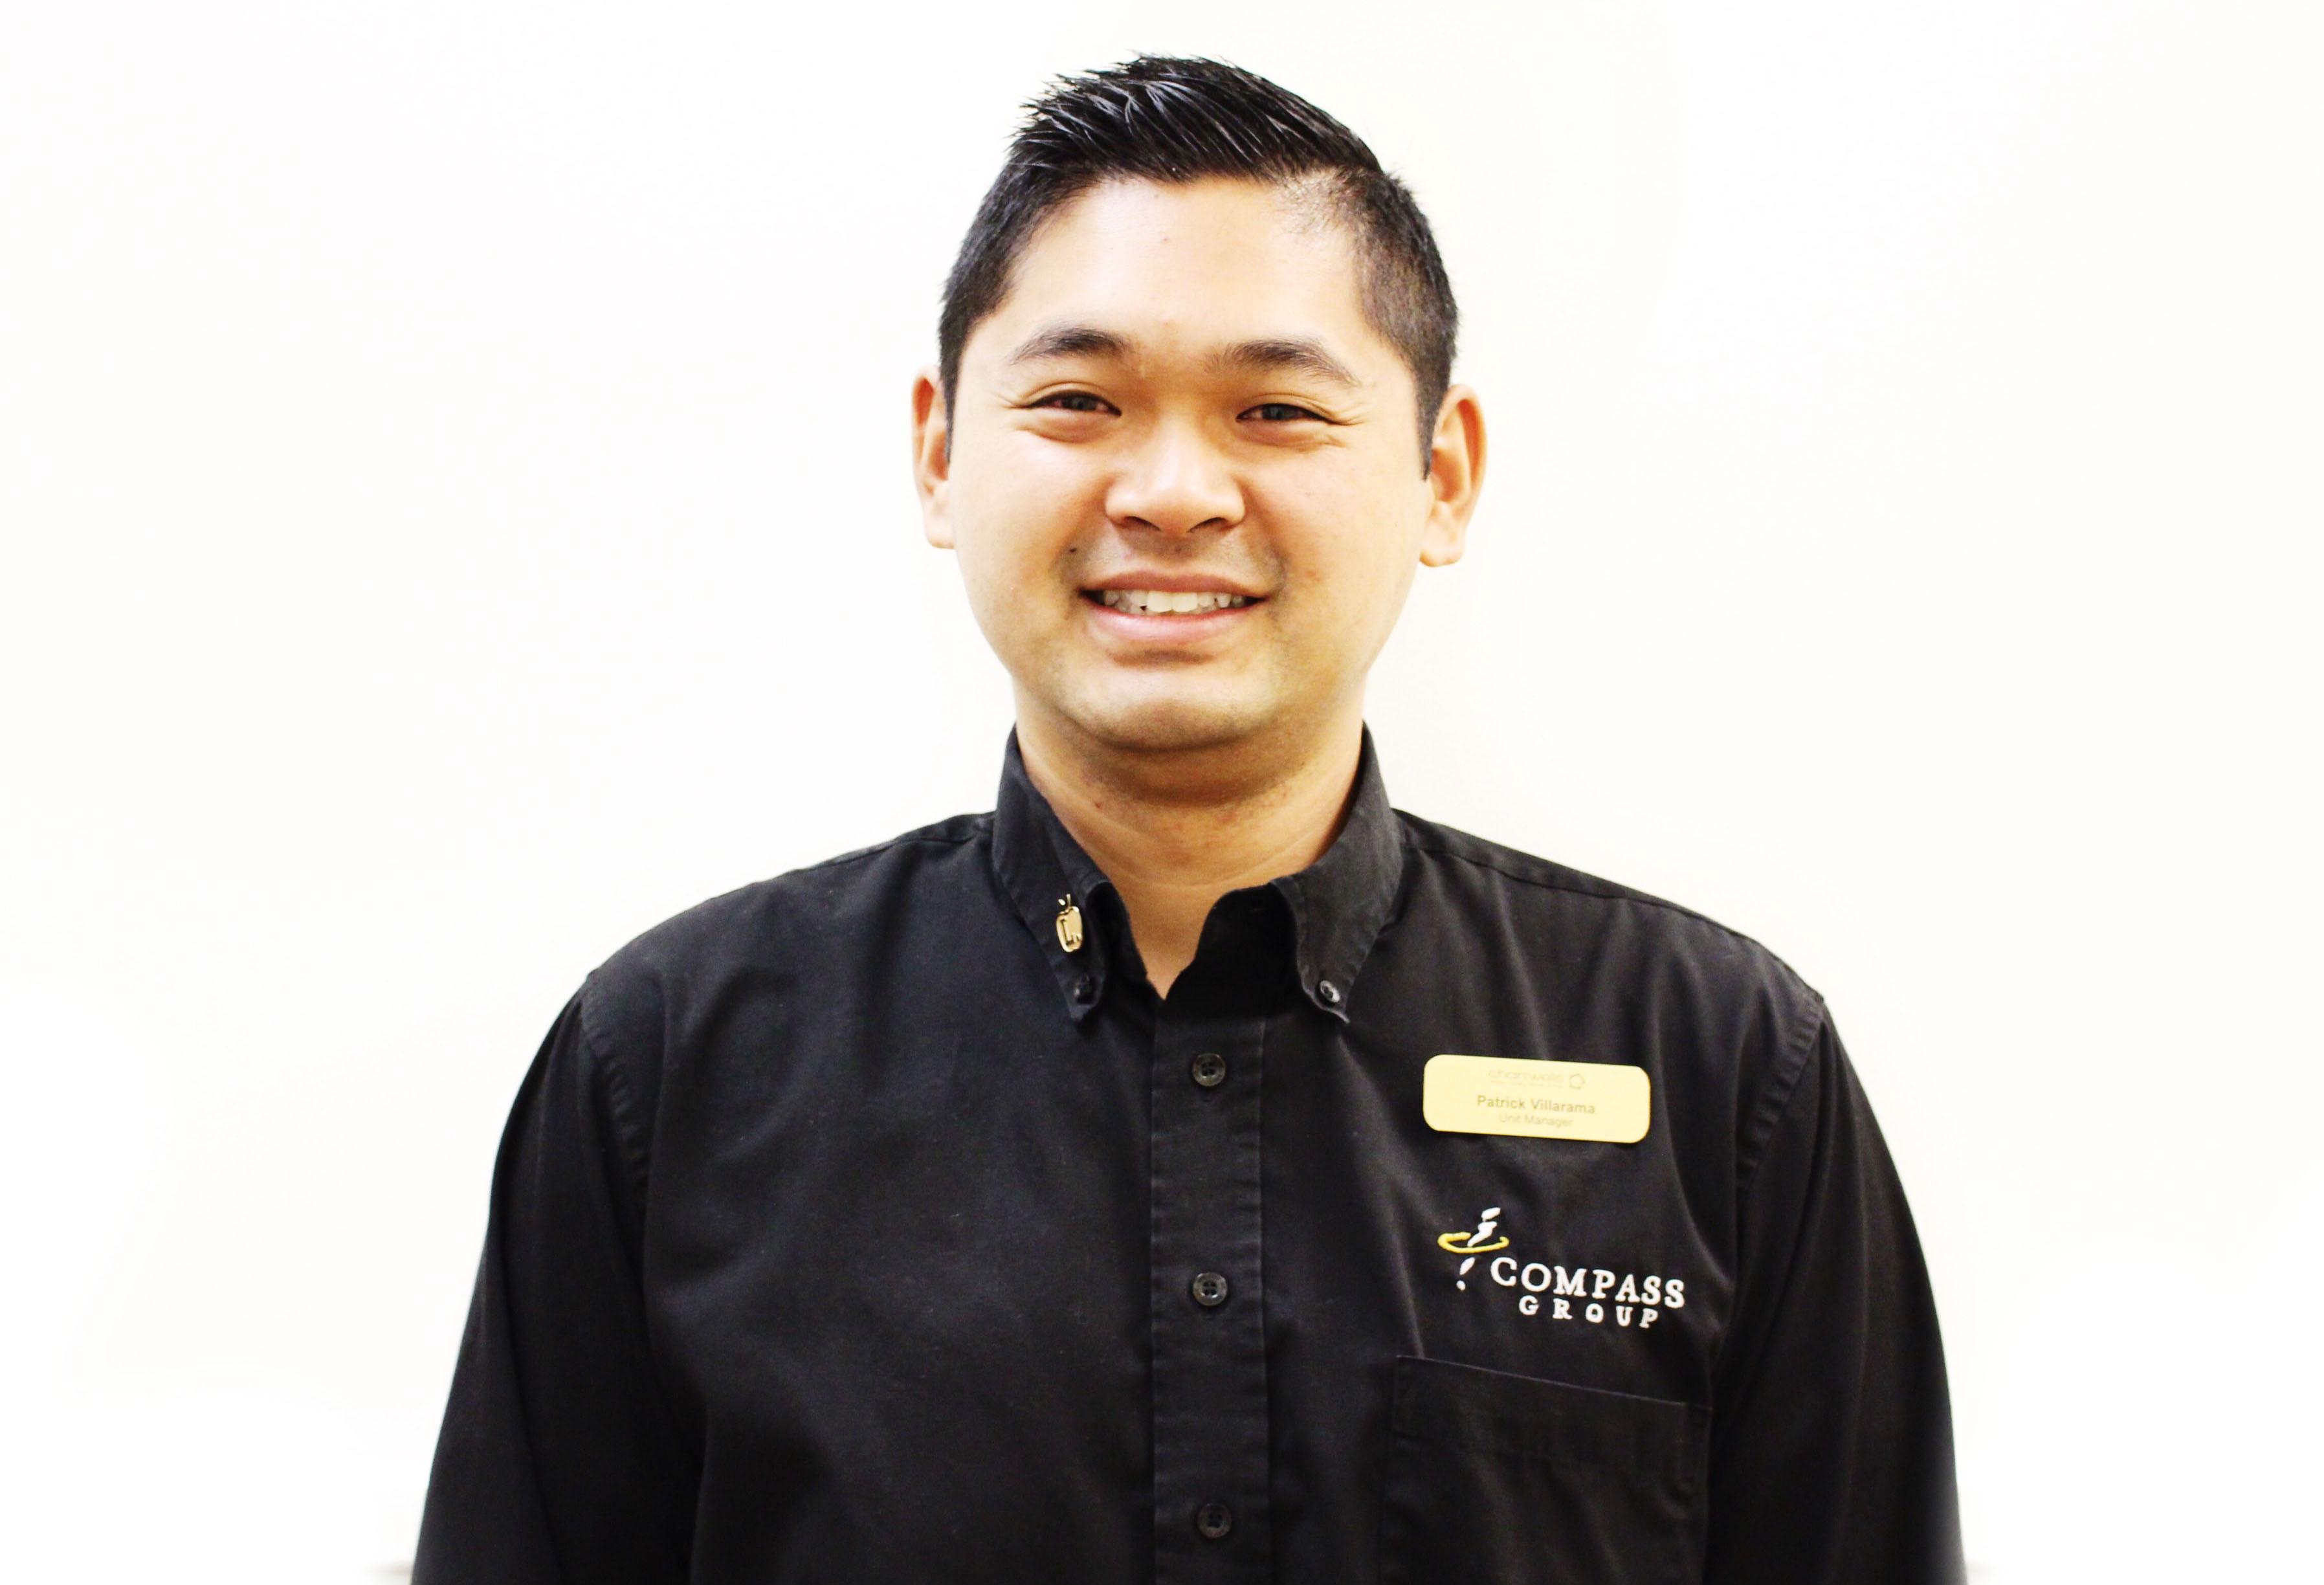 Patrick Villarama - Assistant Food Service Director